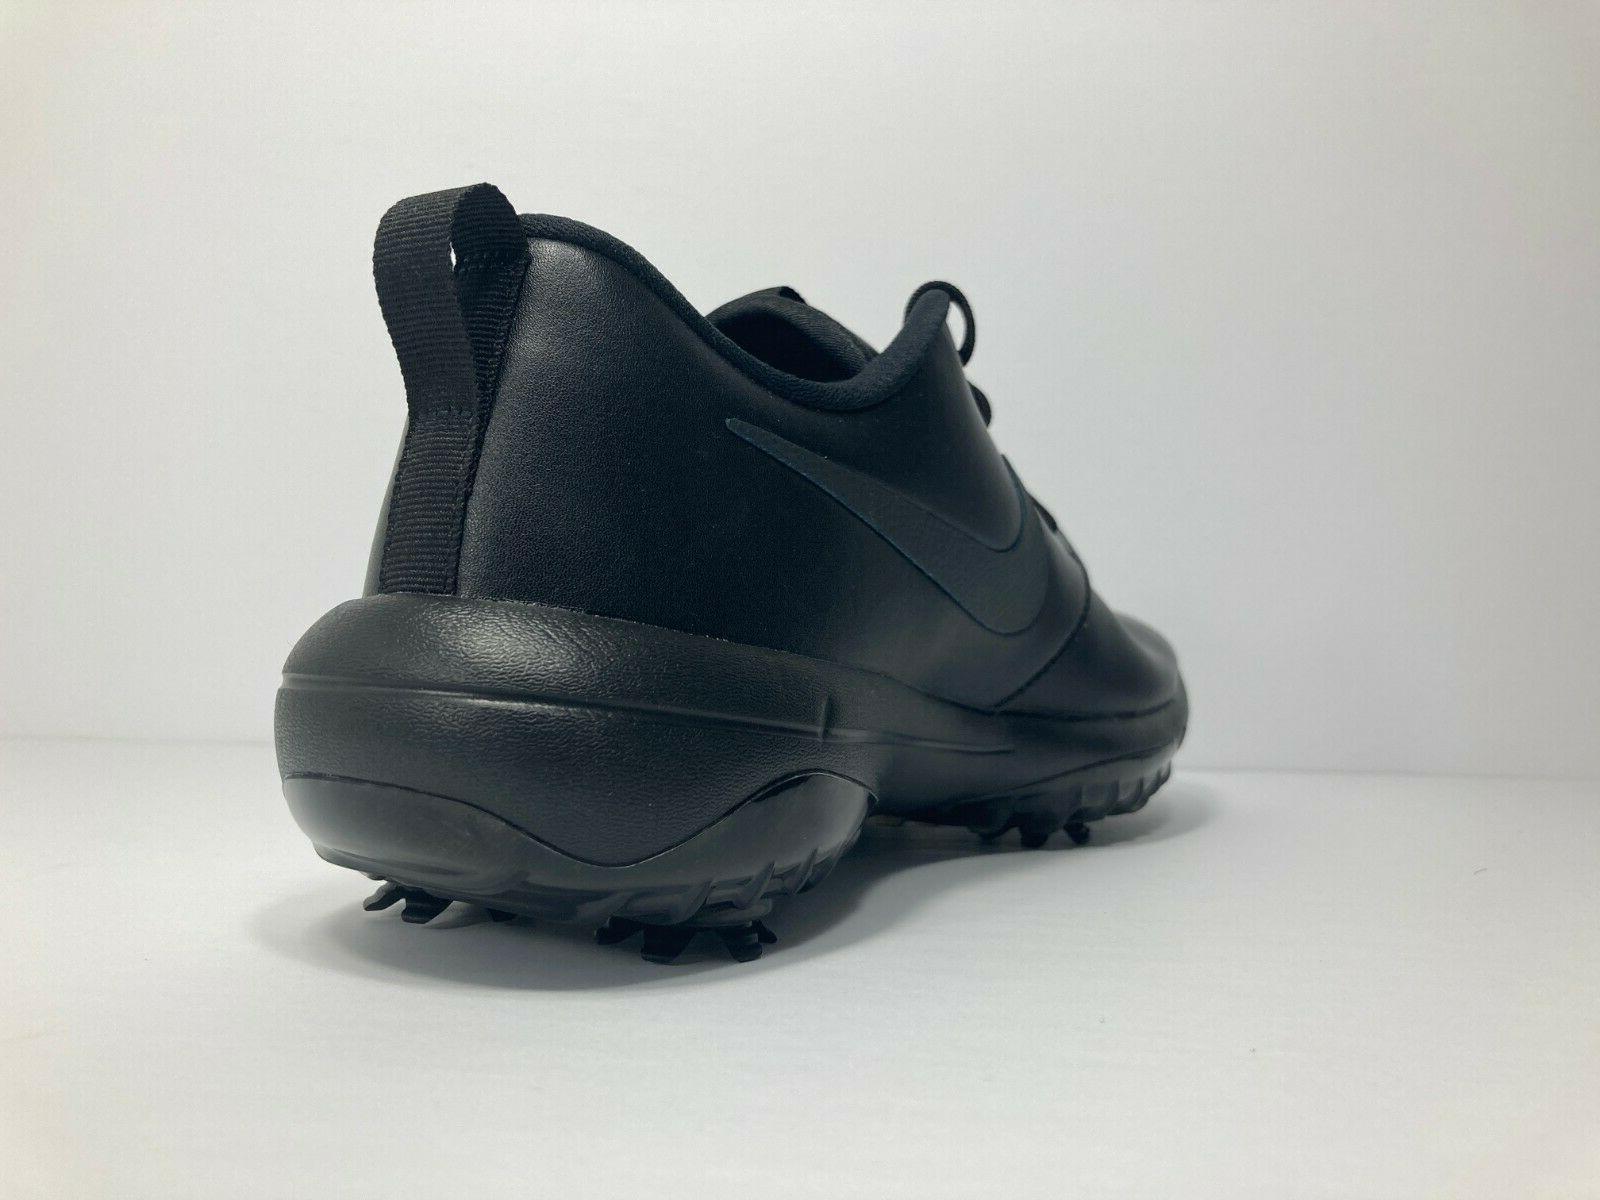 NEW Nike G Tour Golf Shoes Black